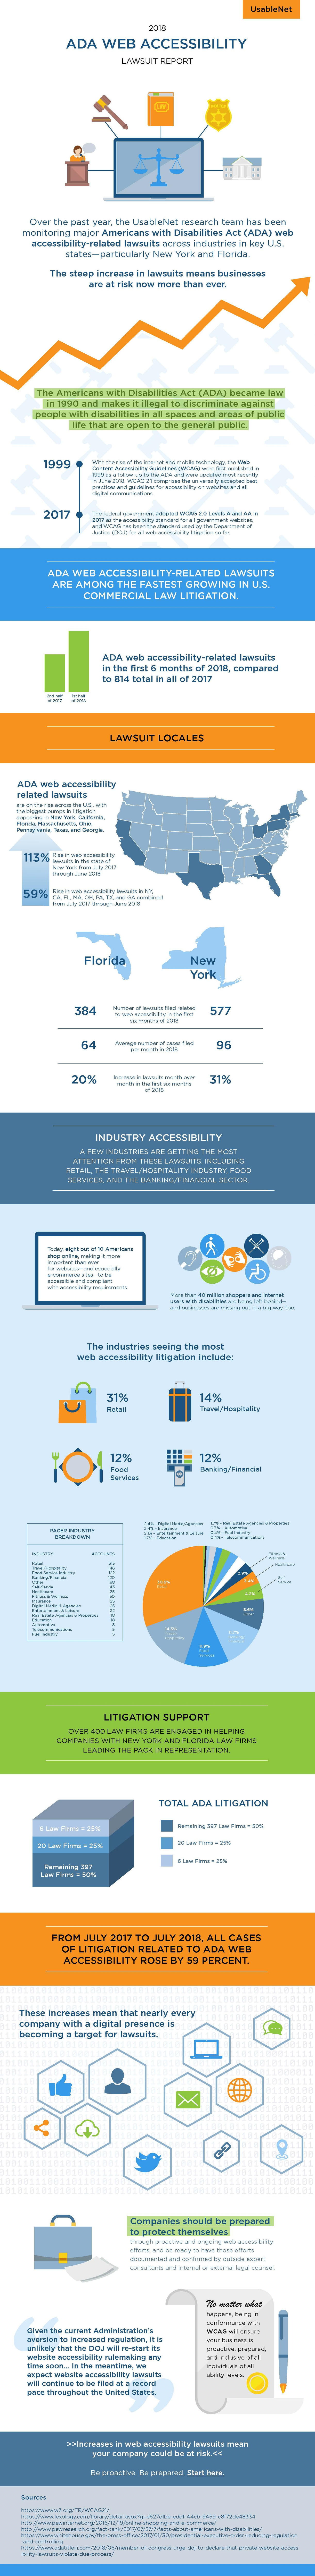 ADA Lawsuit Infographic image